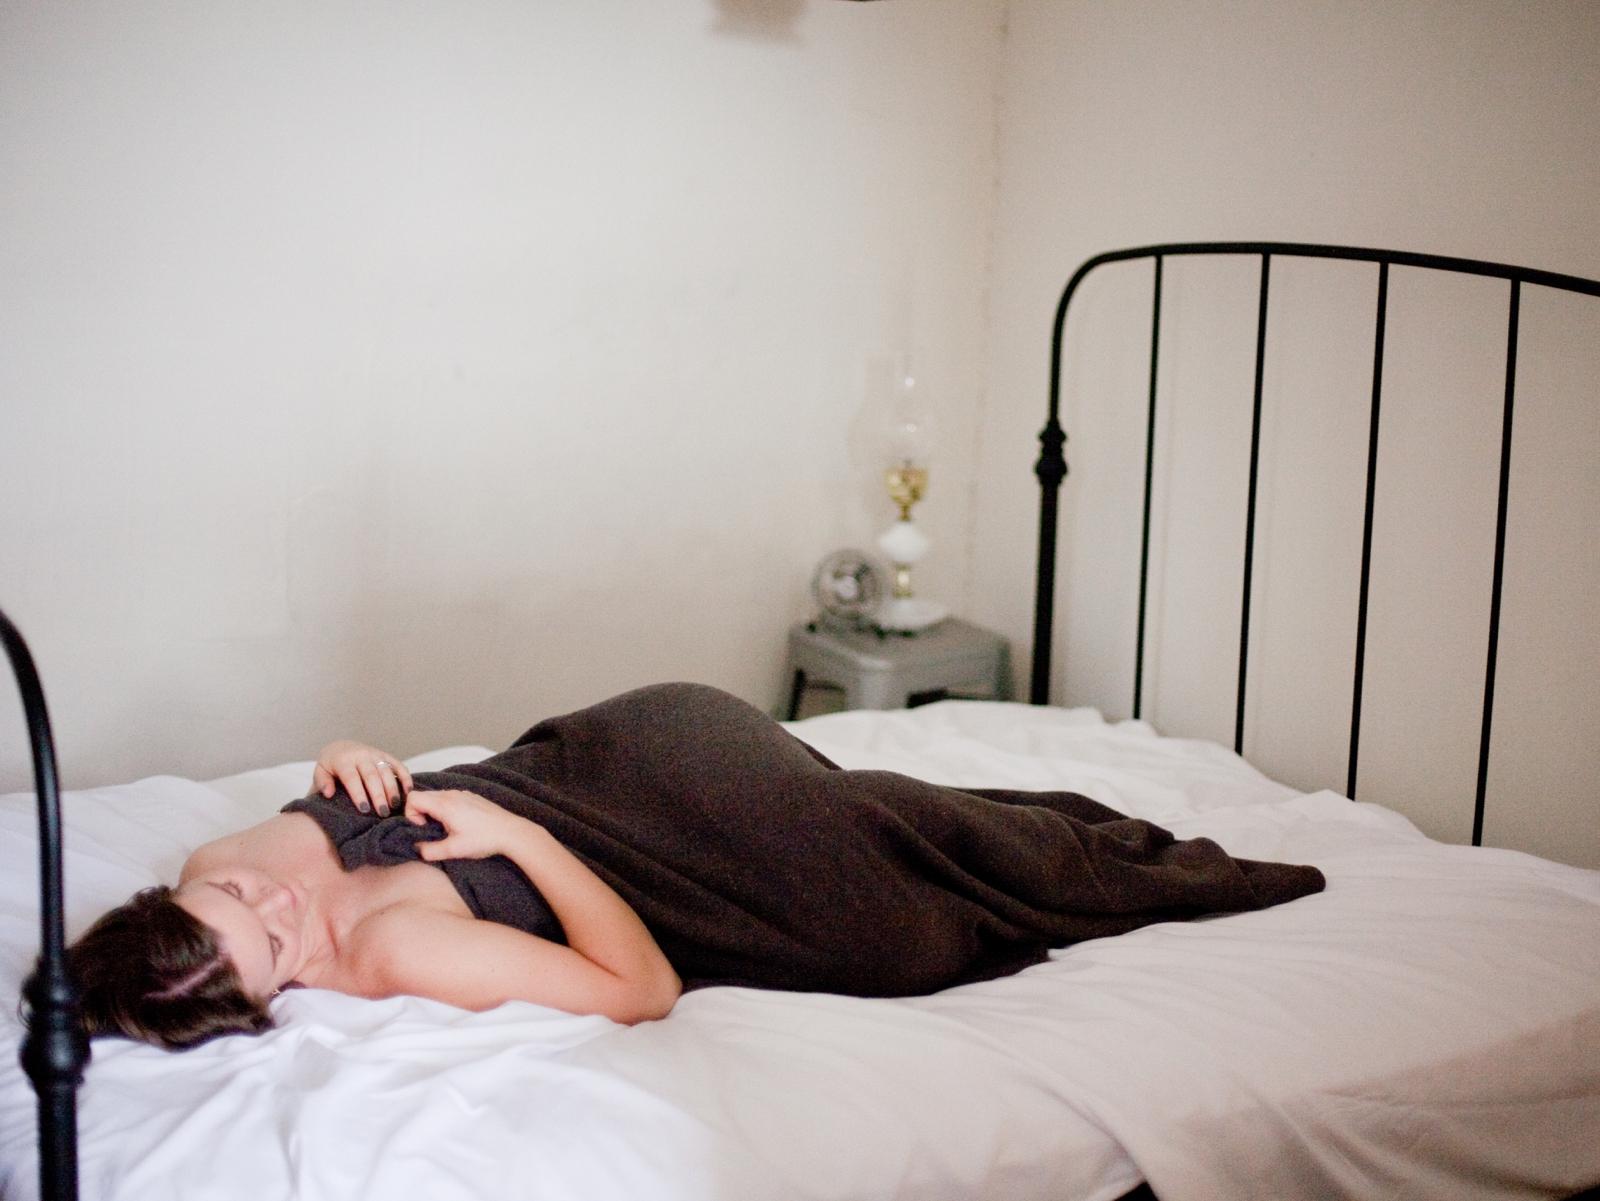 moody fine art boudoir photographer annapolis maryland boudoir photographer shannon griffin_0002.jpg